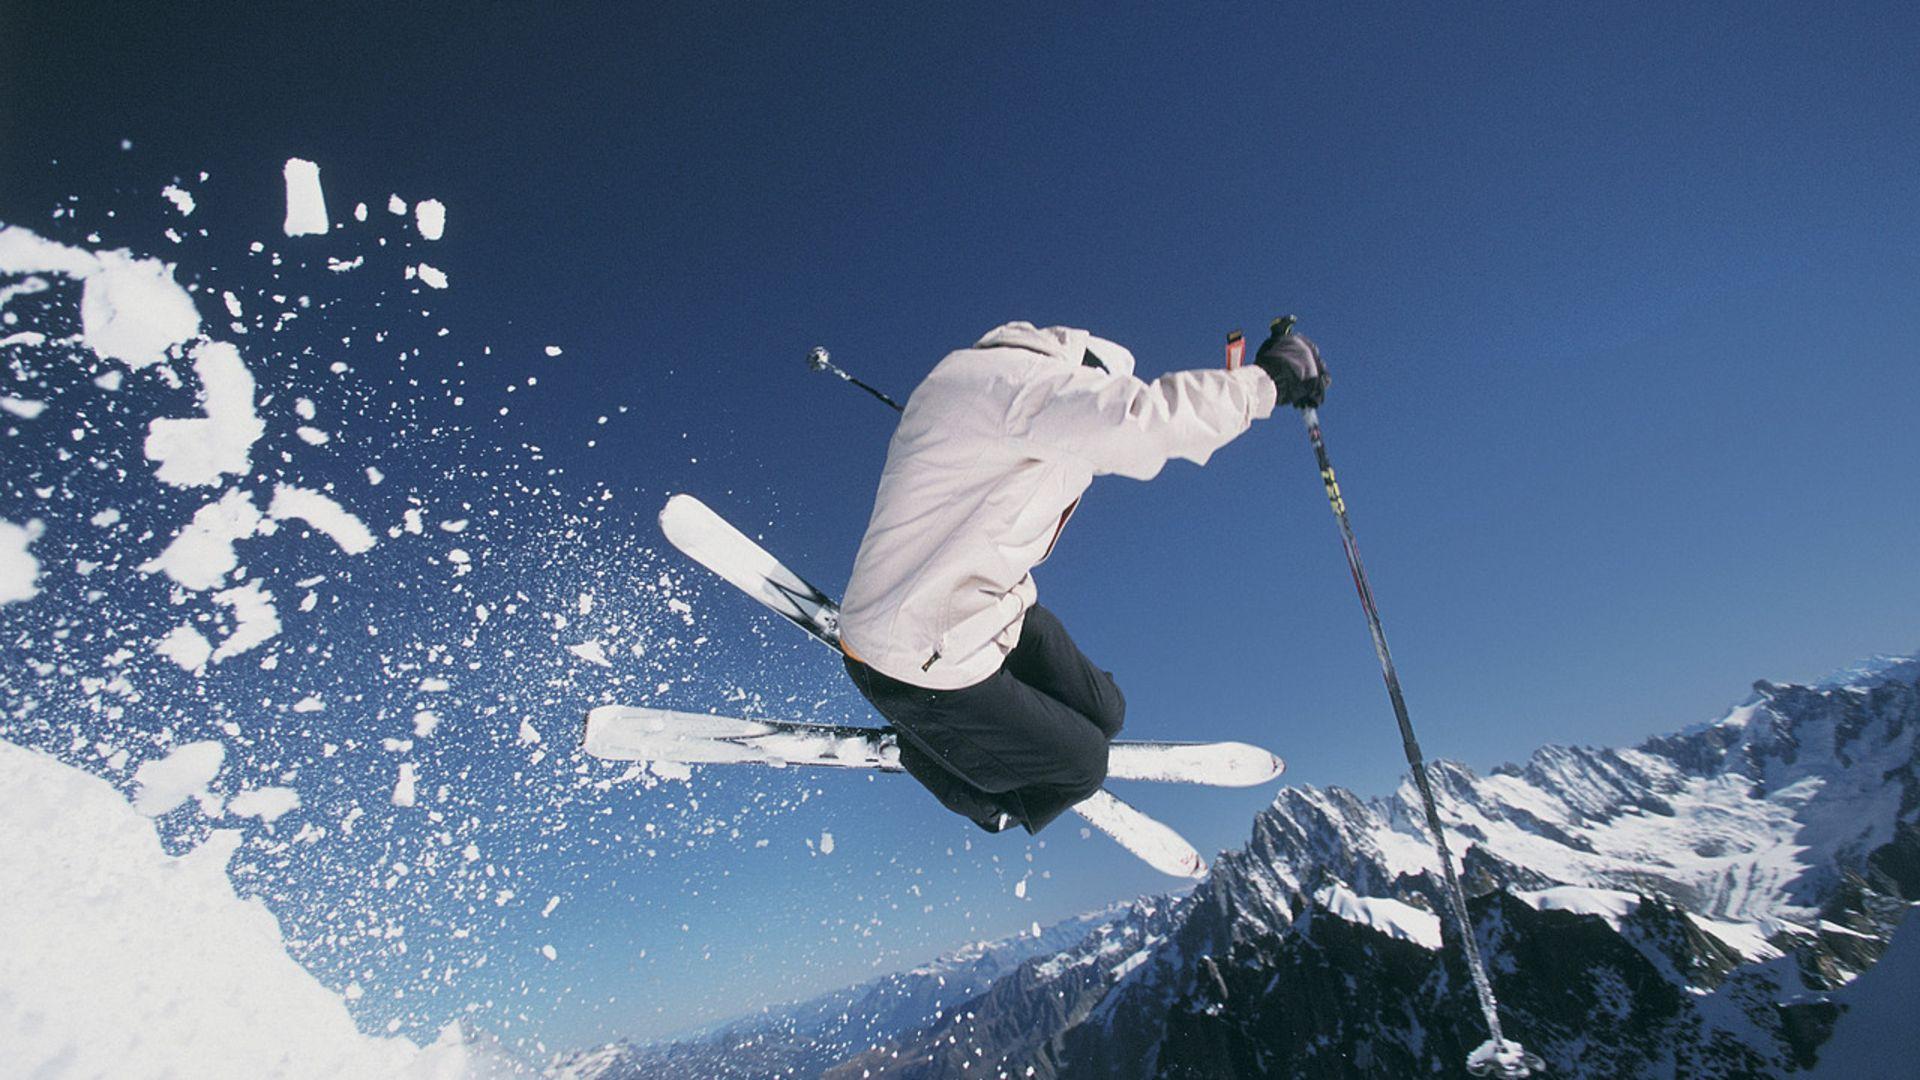 Skiing Wallpapers